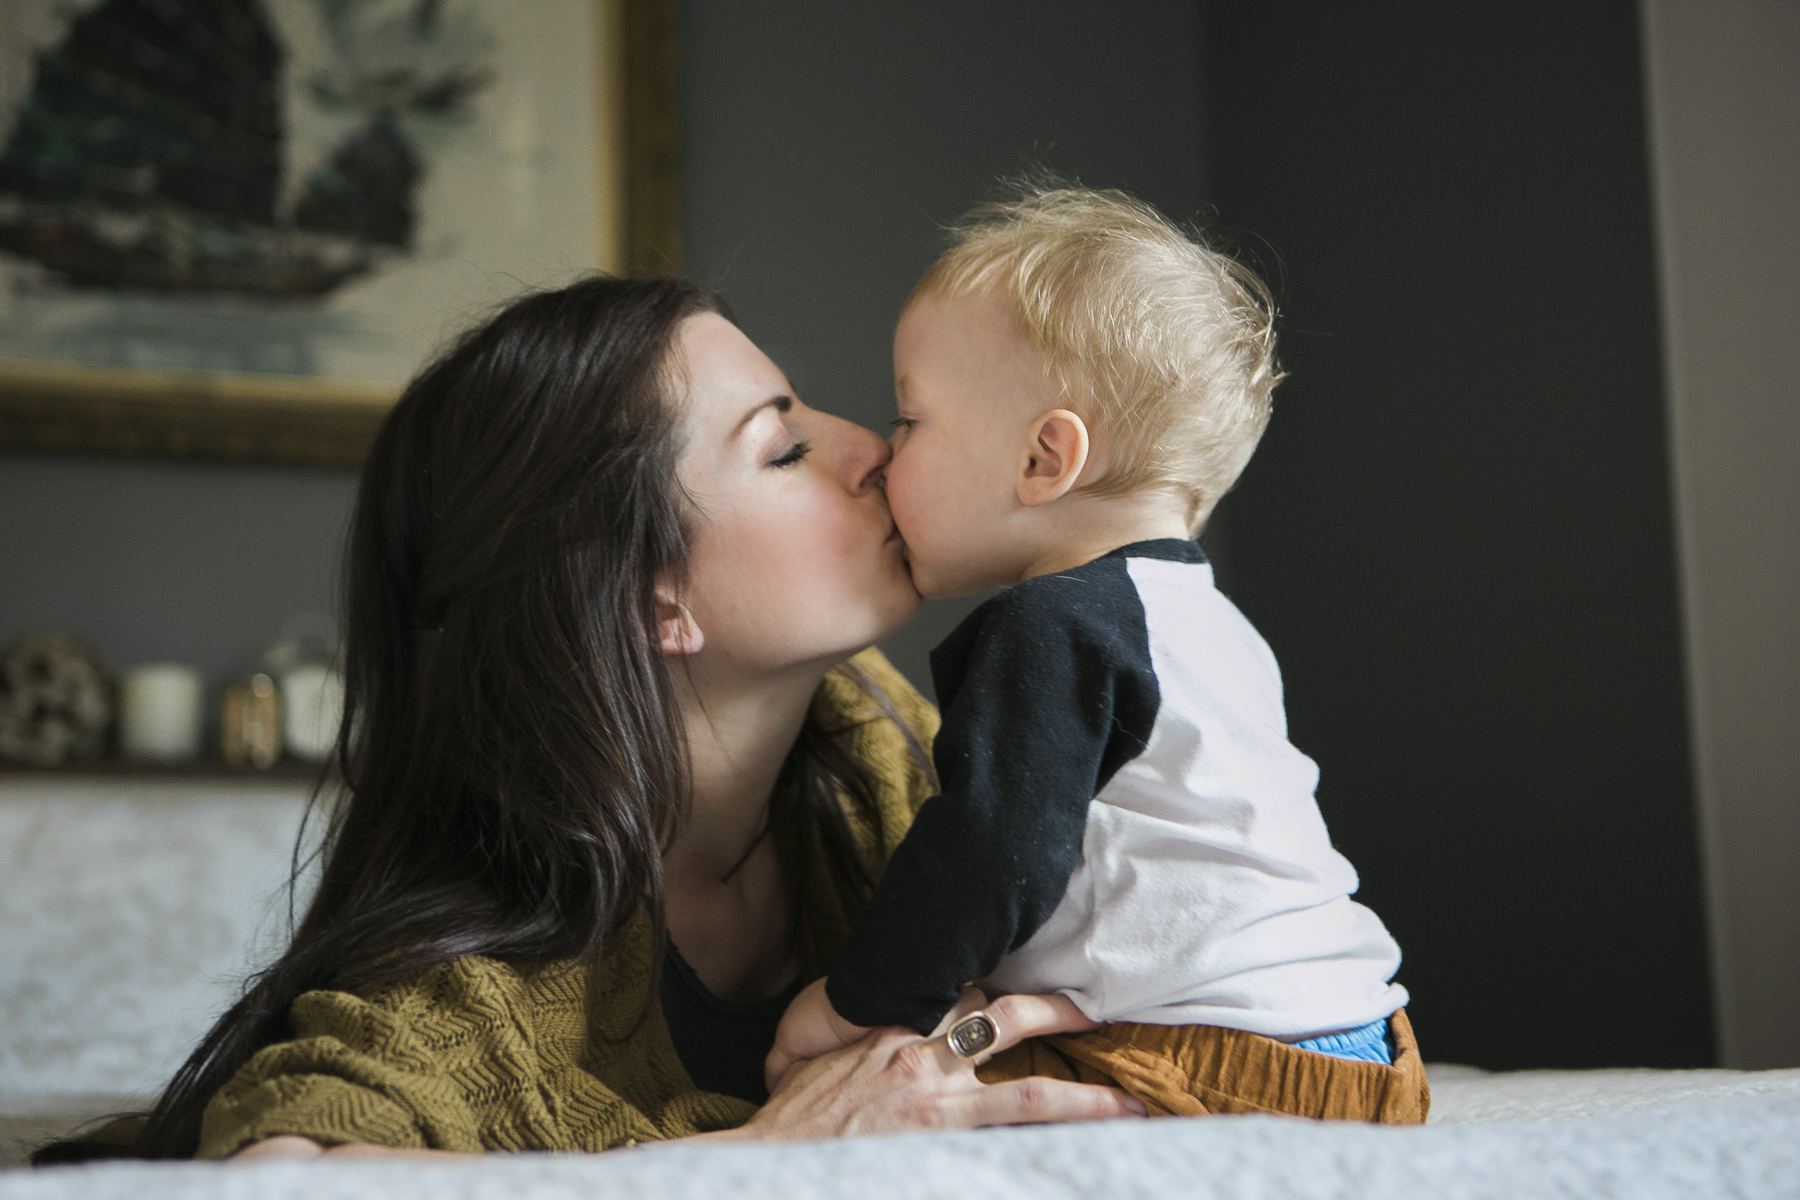 Katie Nugent- Okanagan family photographer, capturing moments not poses.